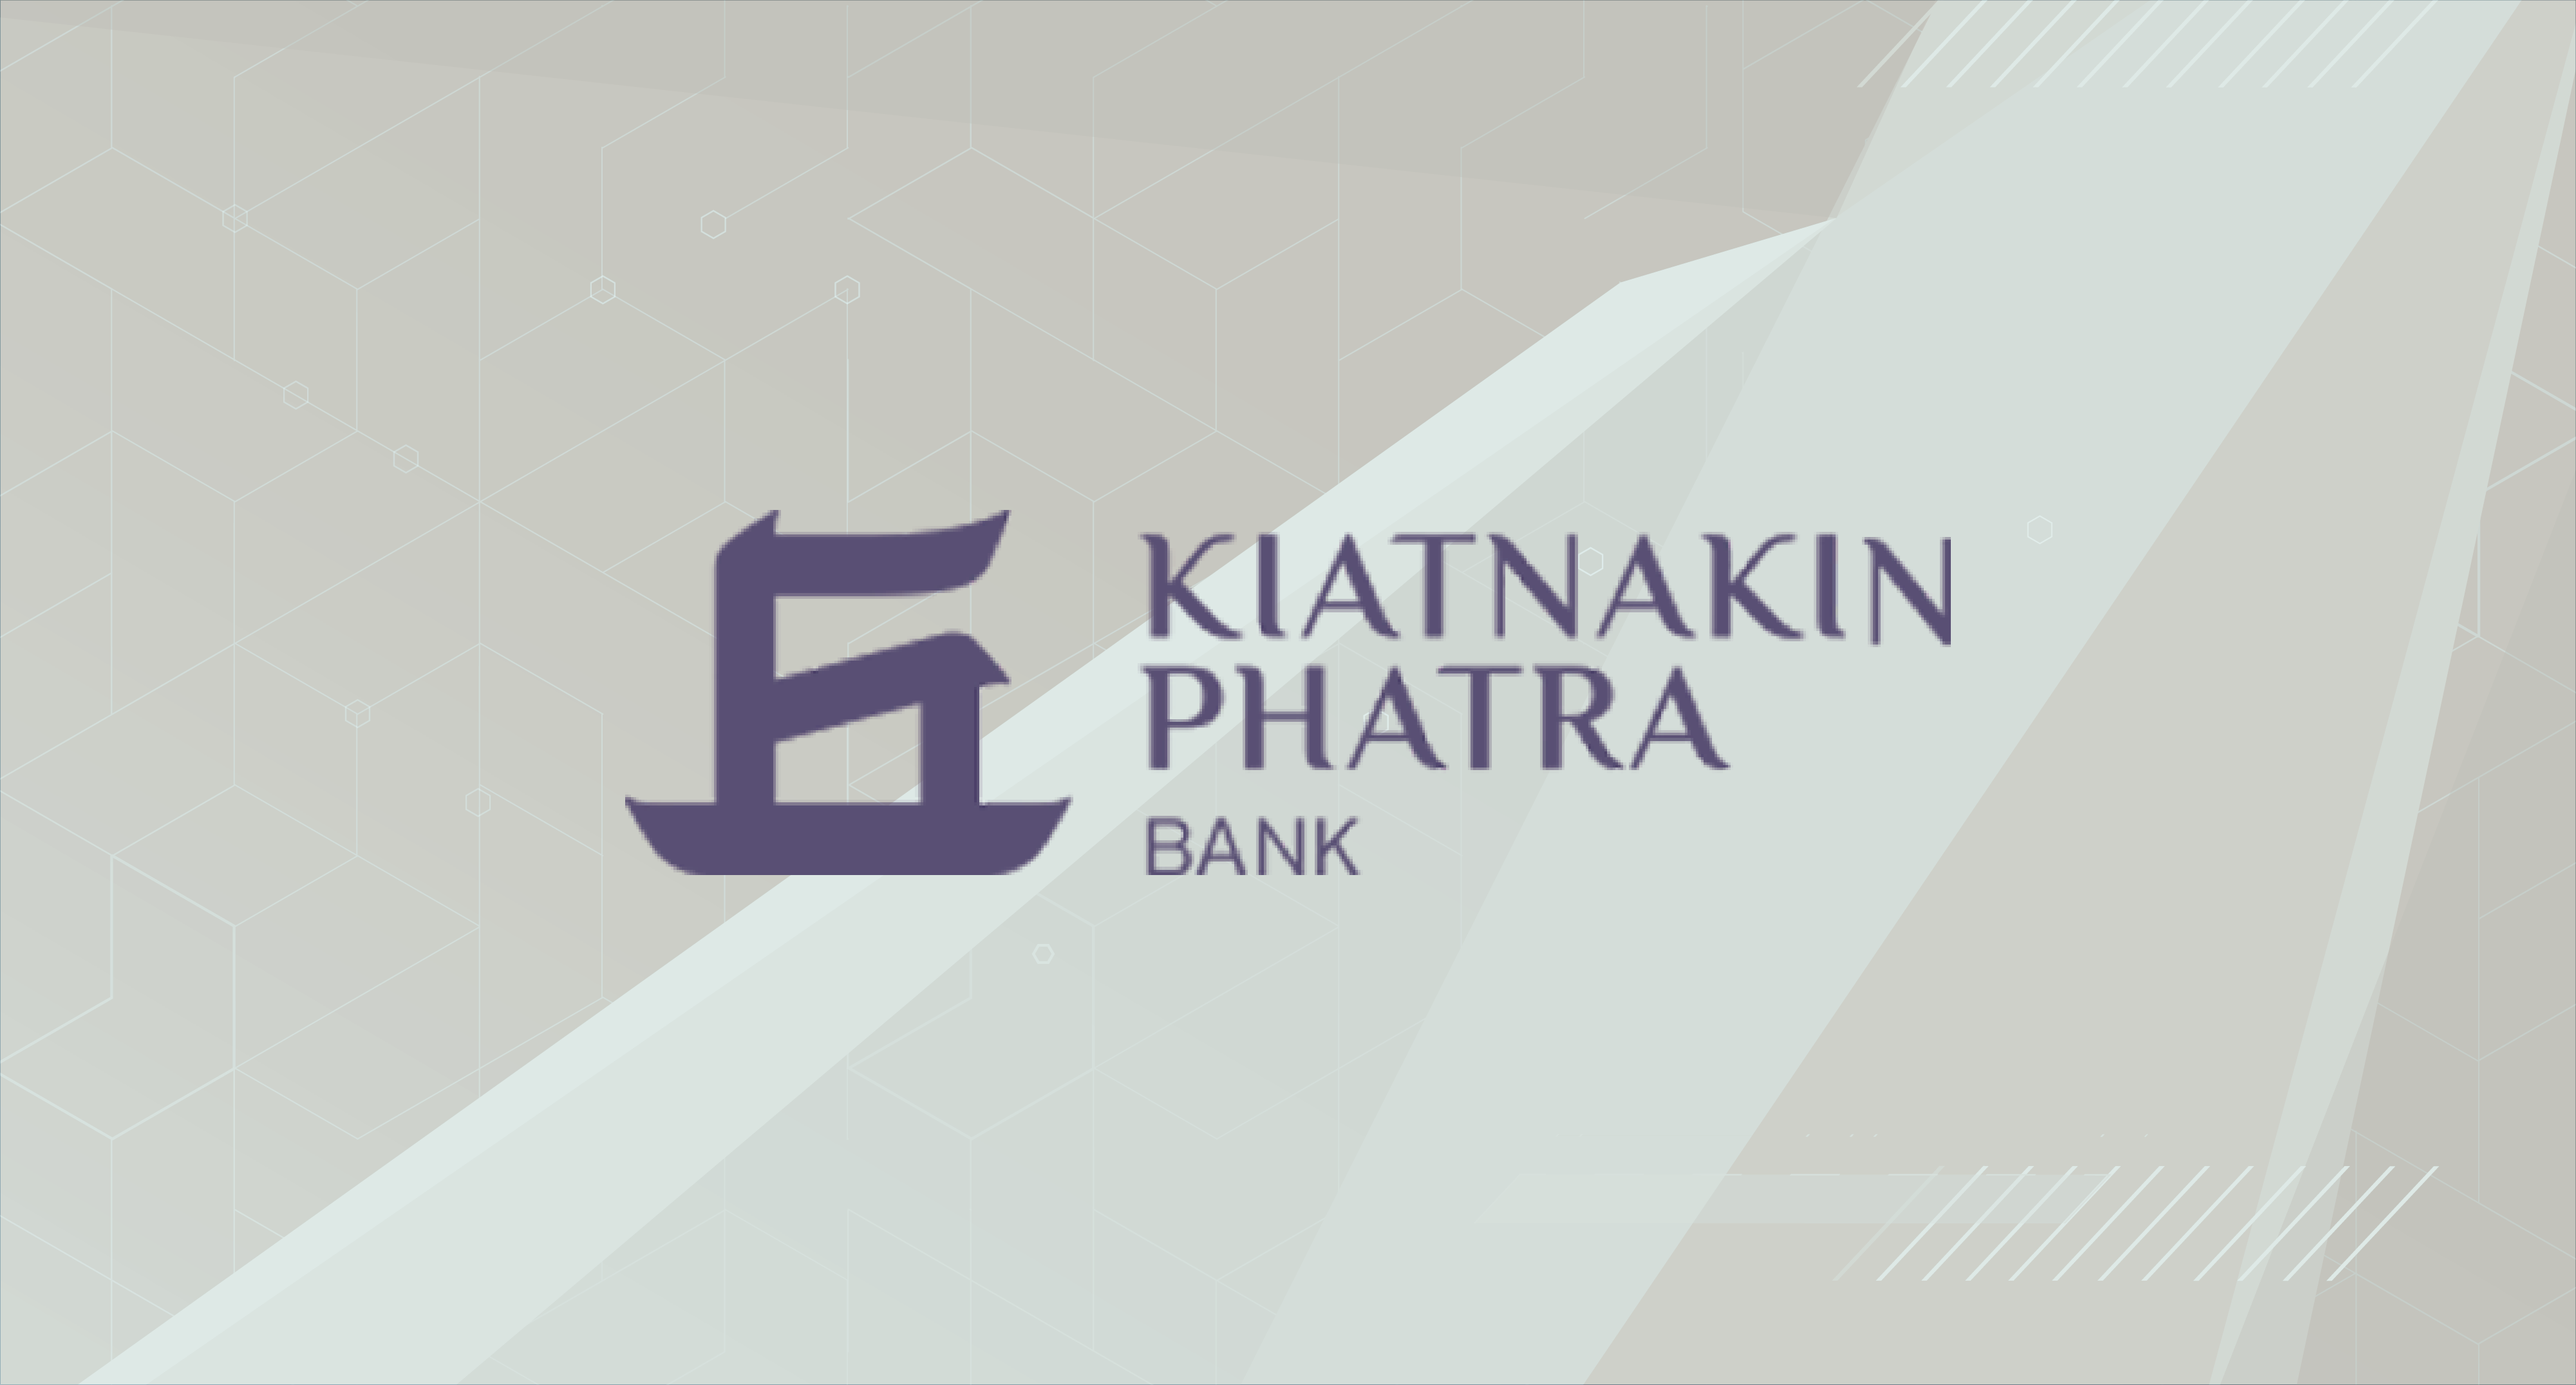 Kiatnakin Phatra Bank Builds Consumer Trust with CyberArk Privileged Access Management Solutions